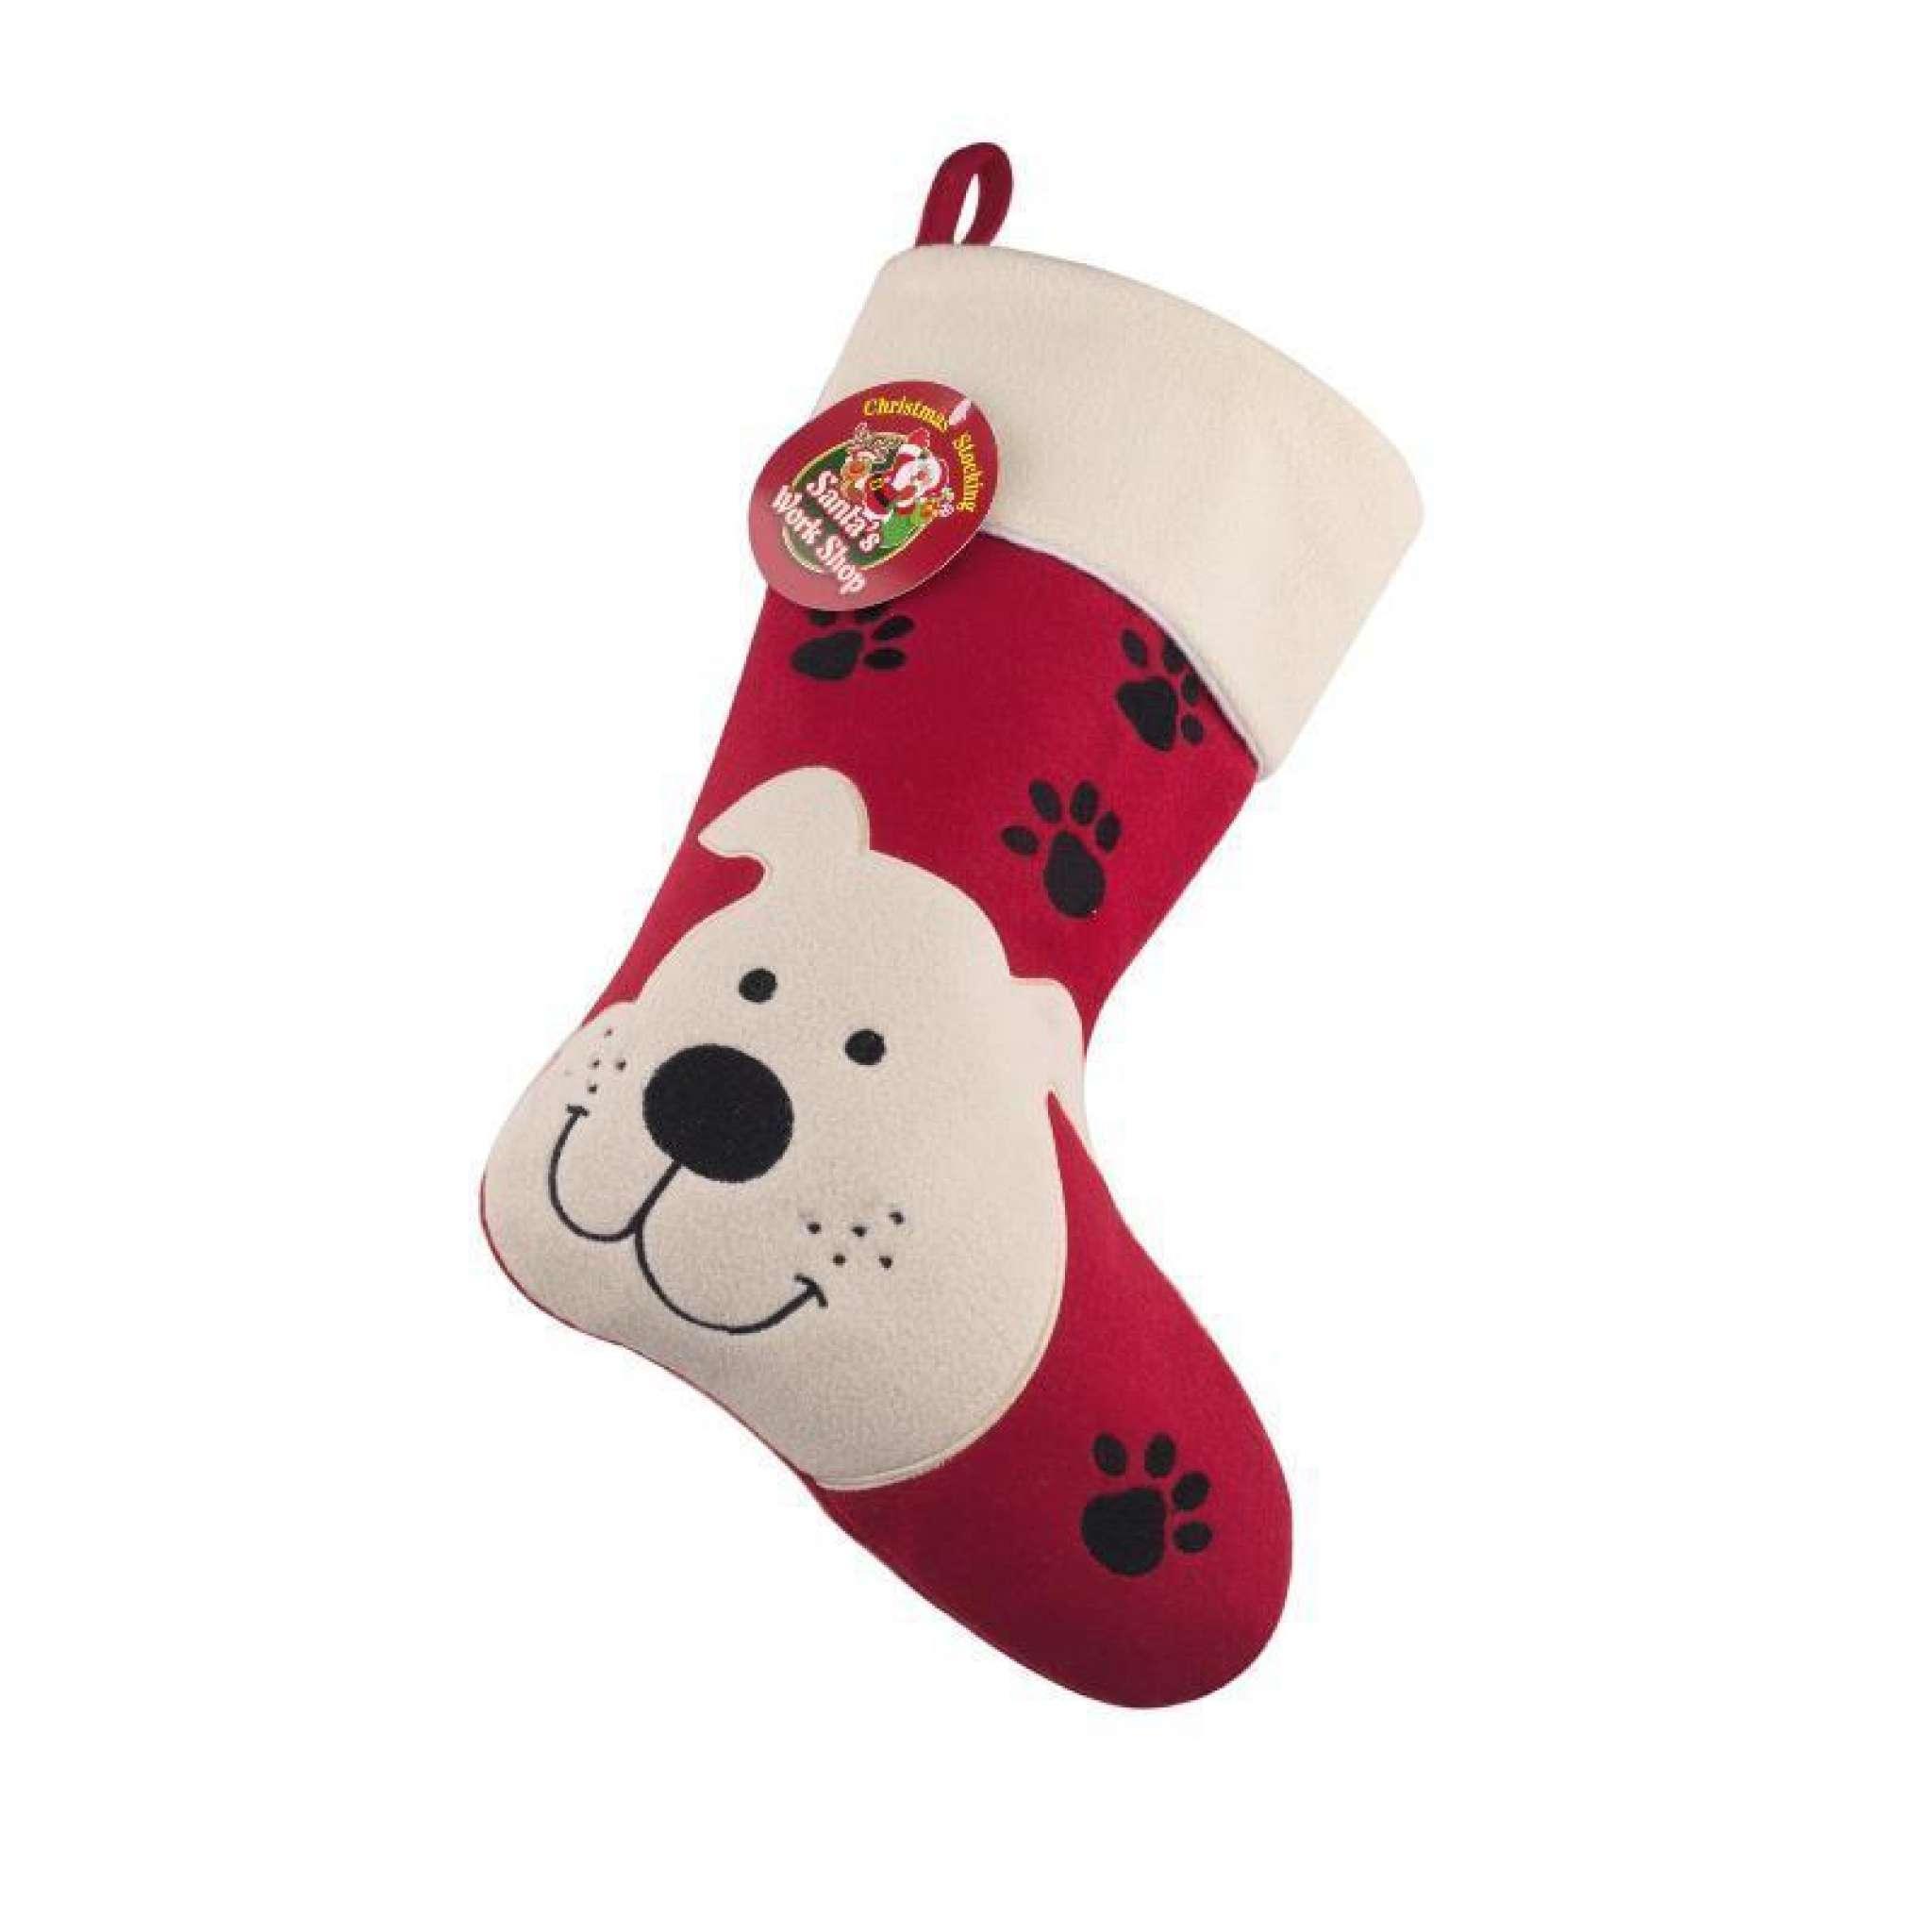 Julstrumpa Premium, Hund